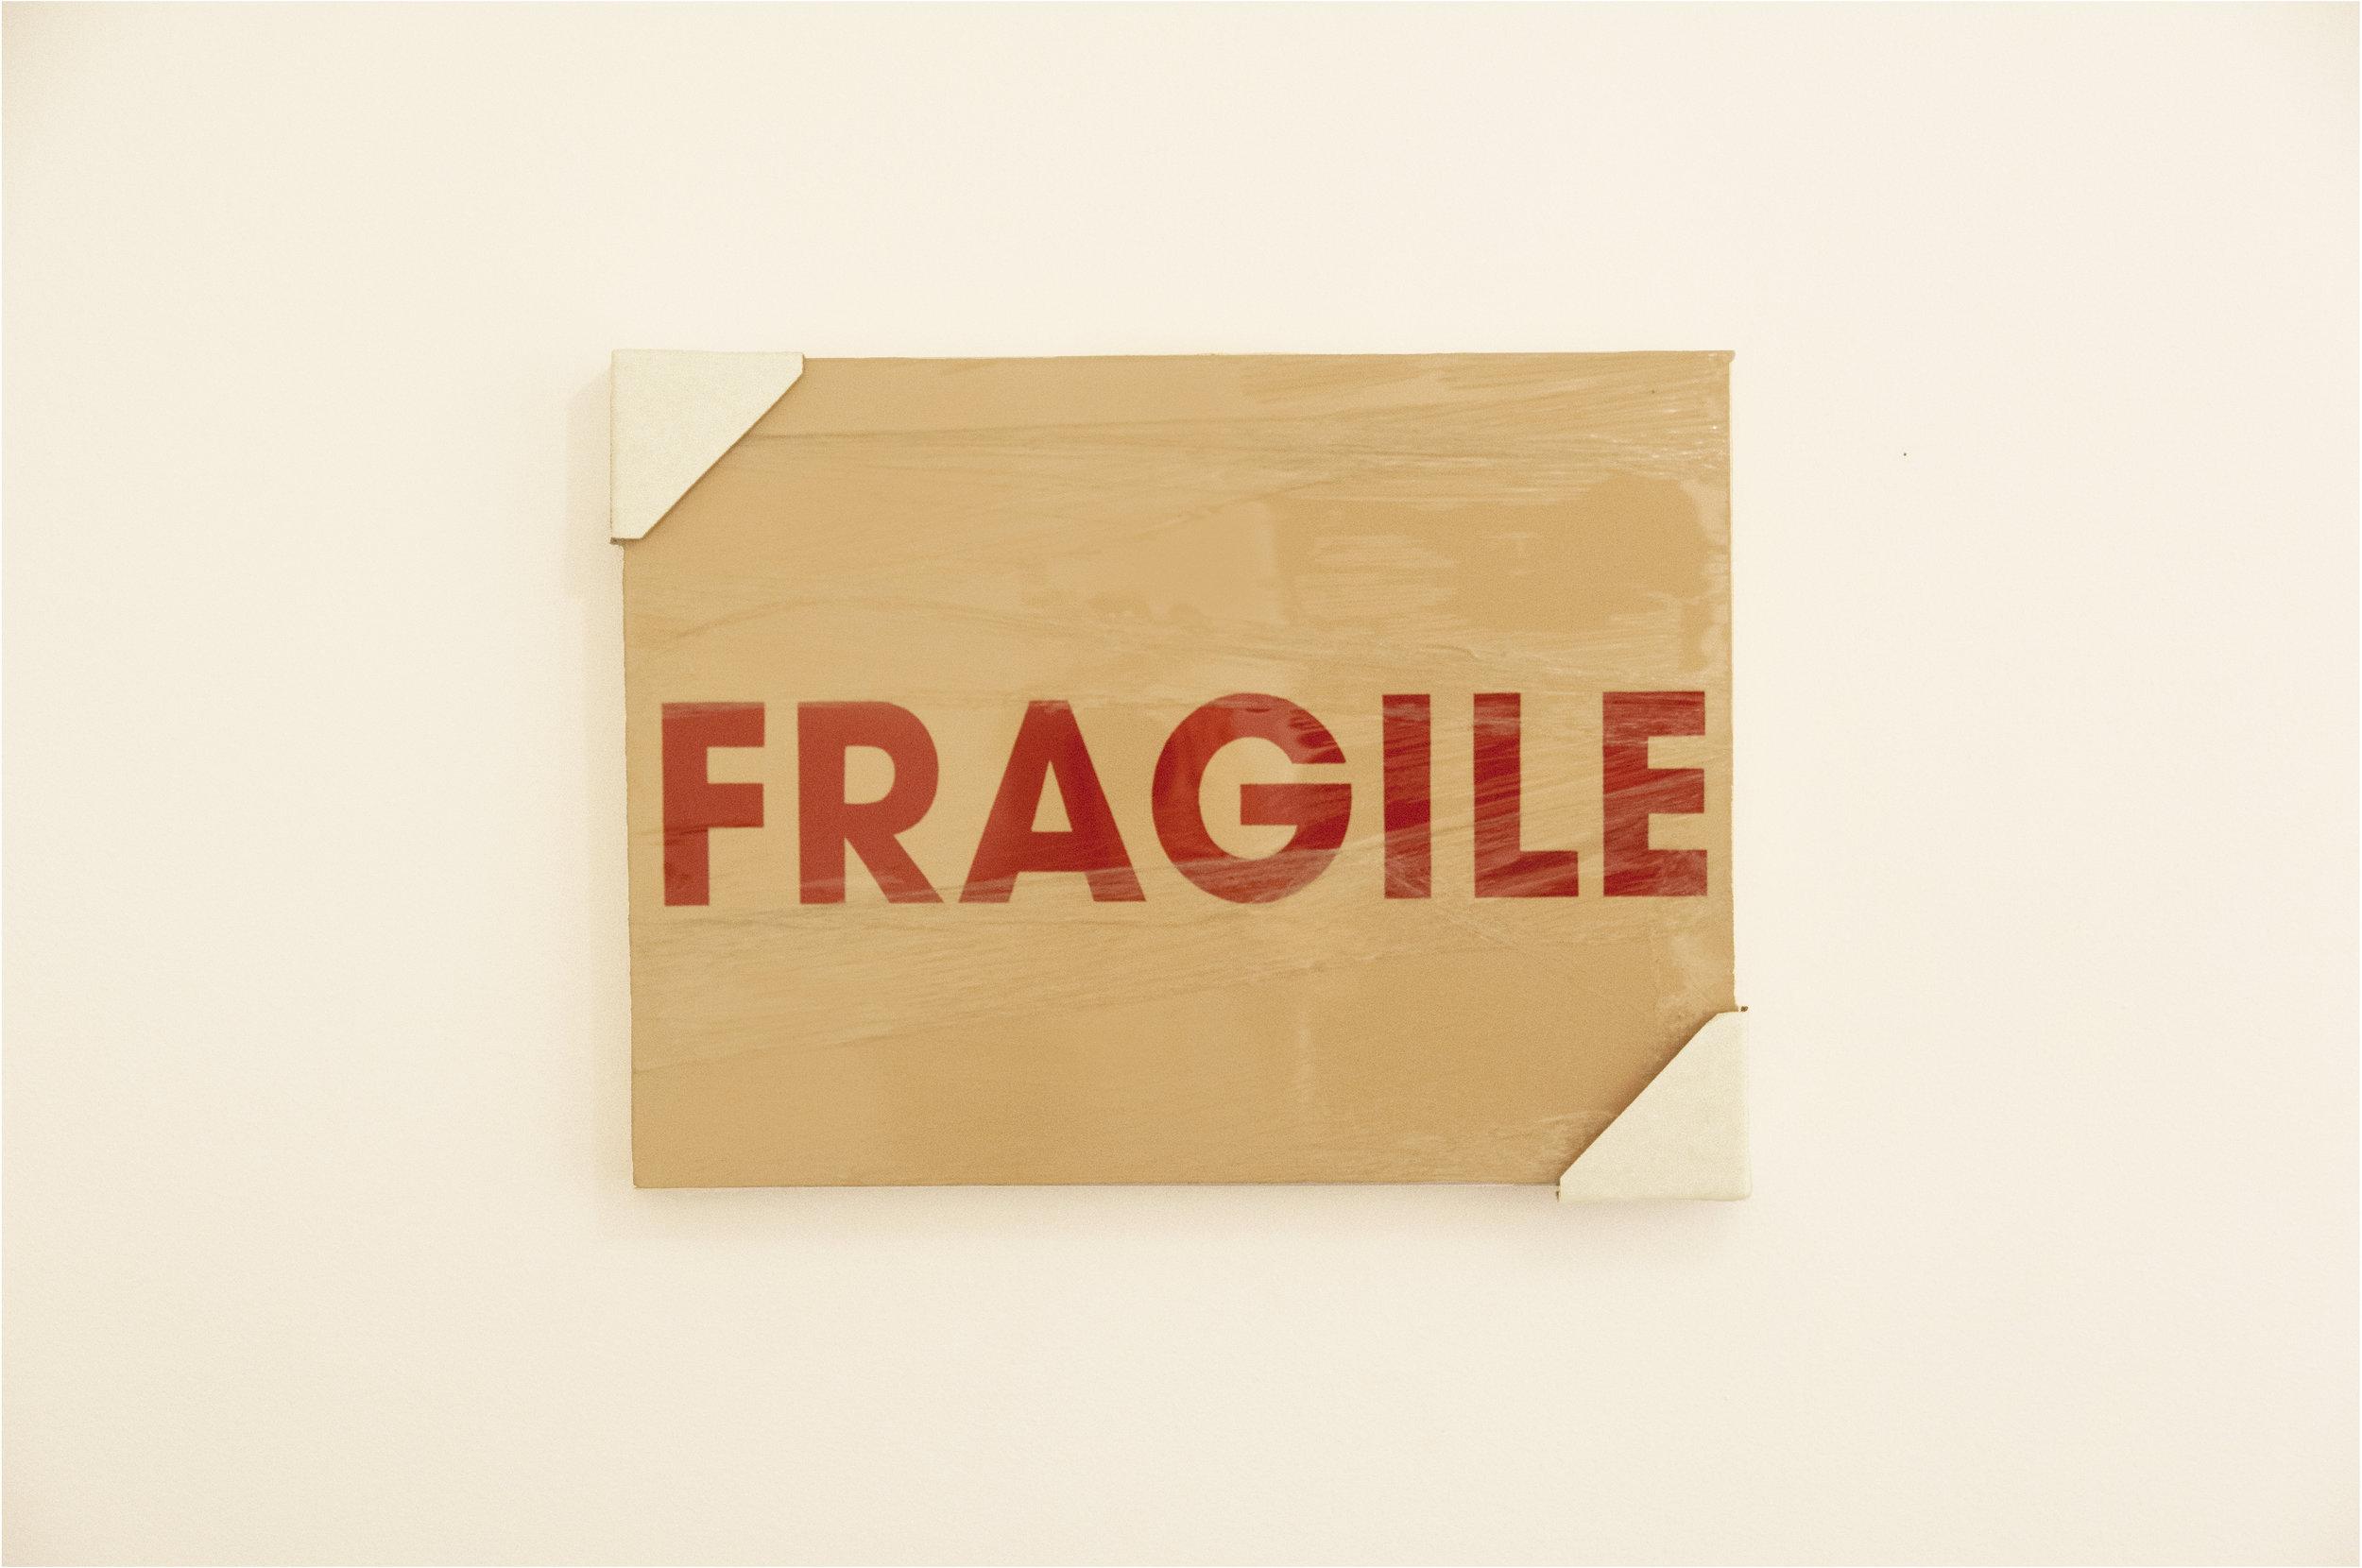 Fragility, acrylic and mixed media on canvas